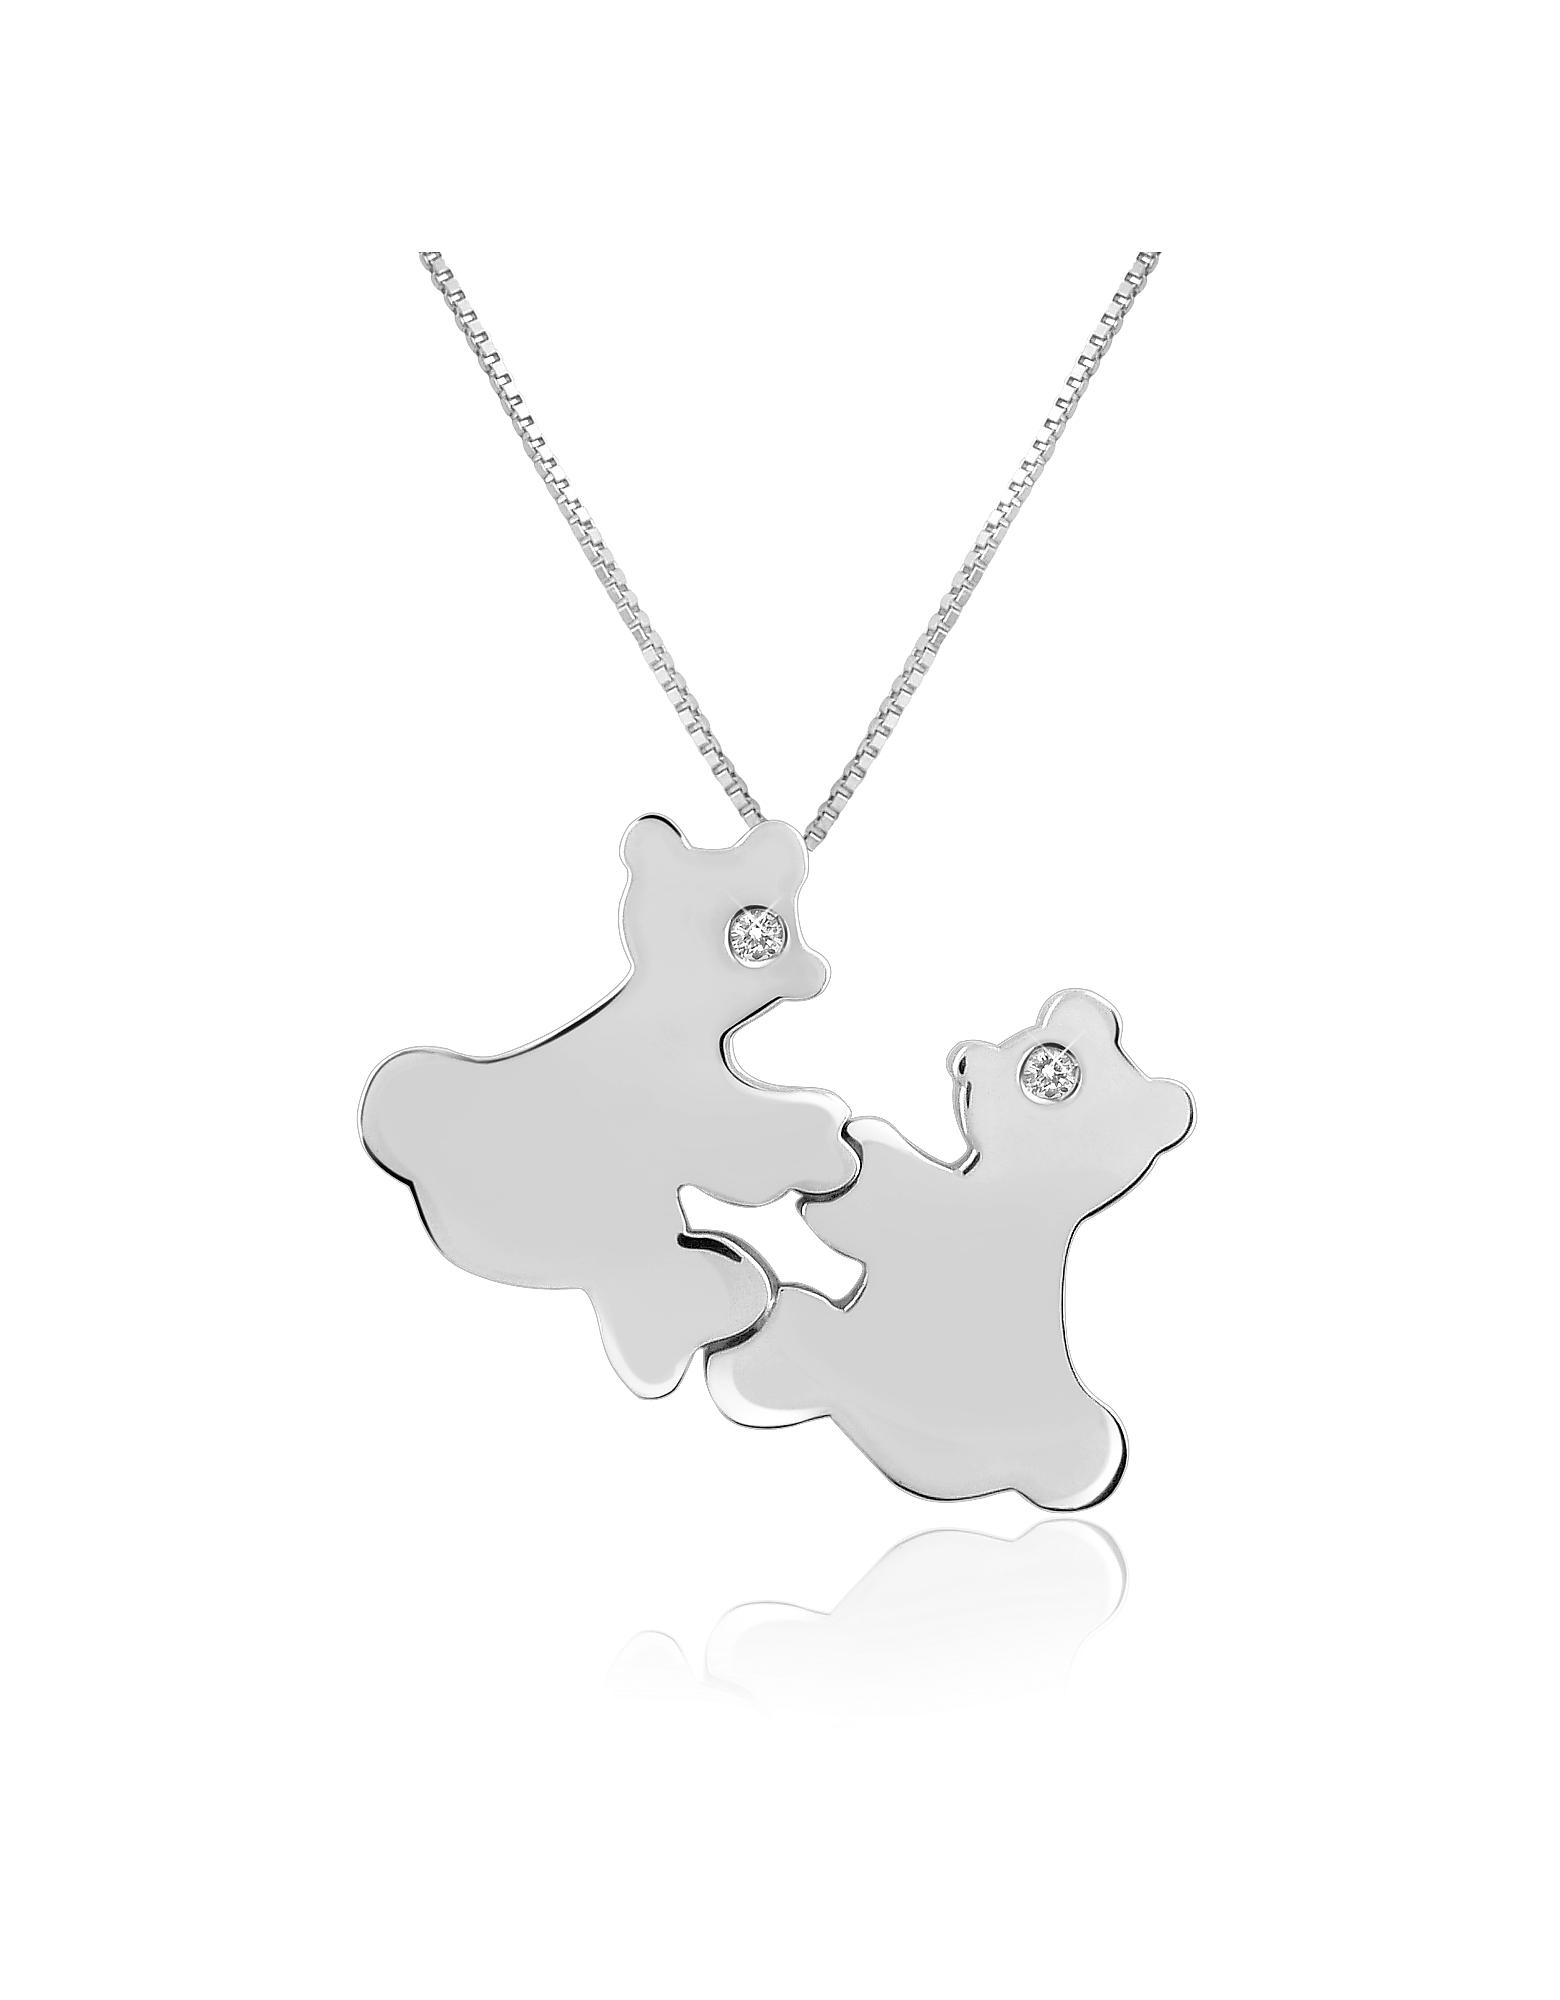 Forzieri Necklaces, Diamond & 18K Gold Teddy Bears Pendant Necklace